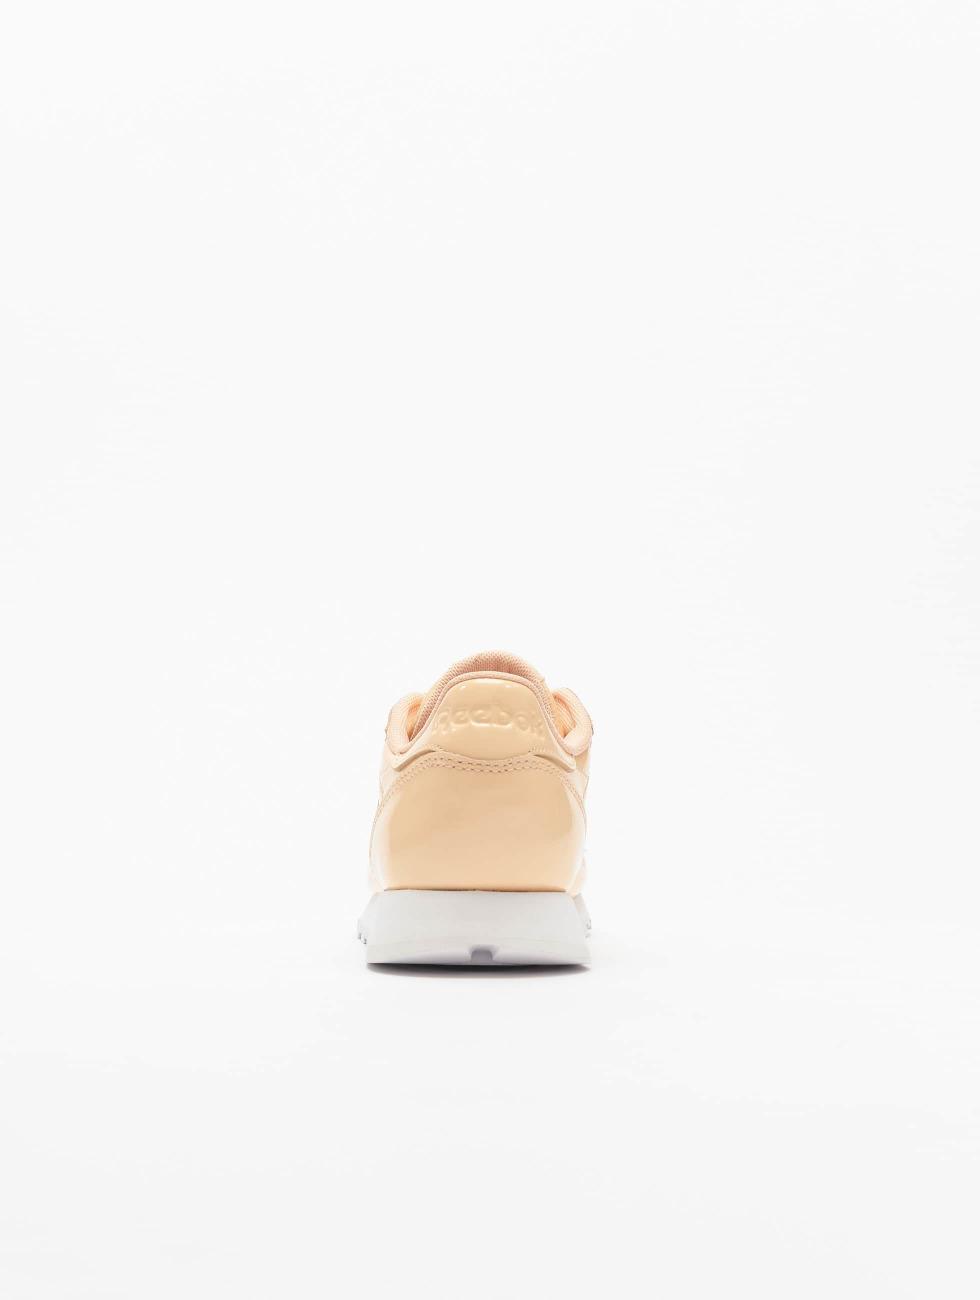 Reebok Sneakers Leather Patent bezowy